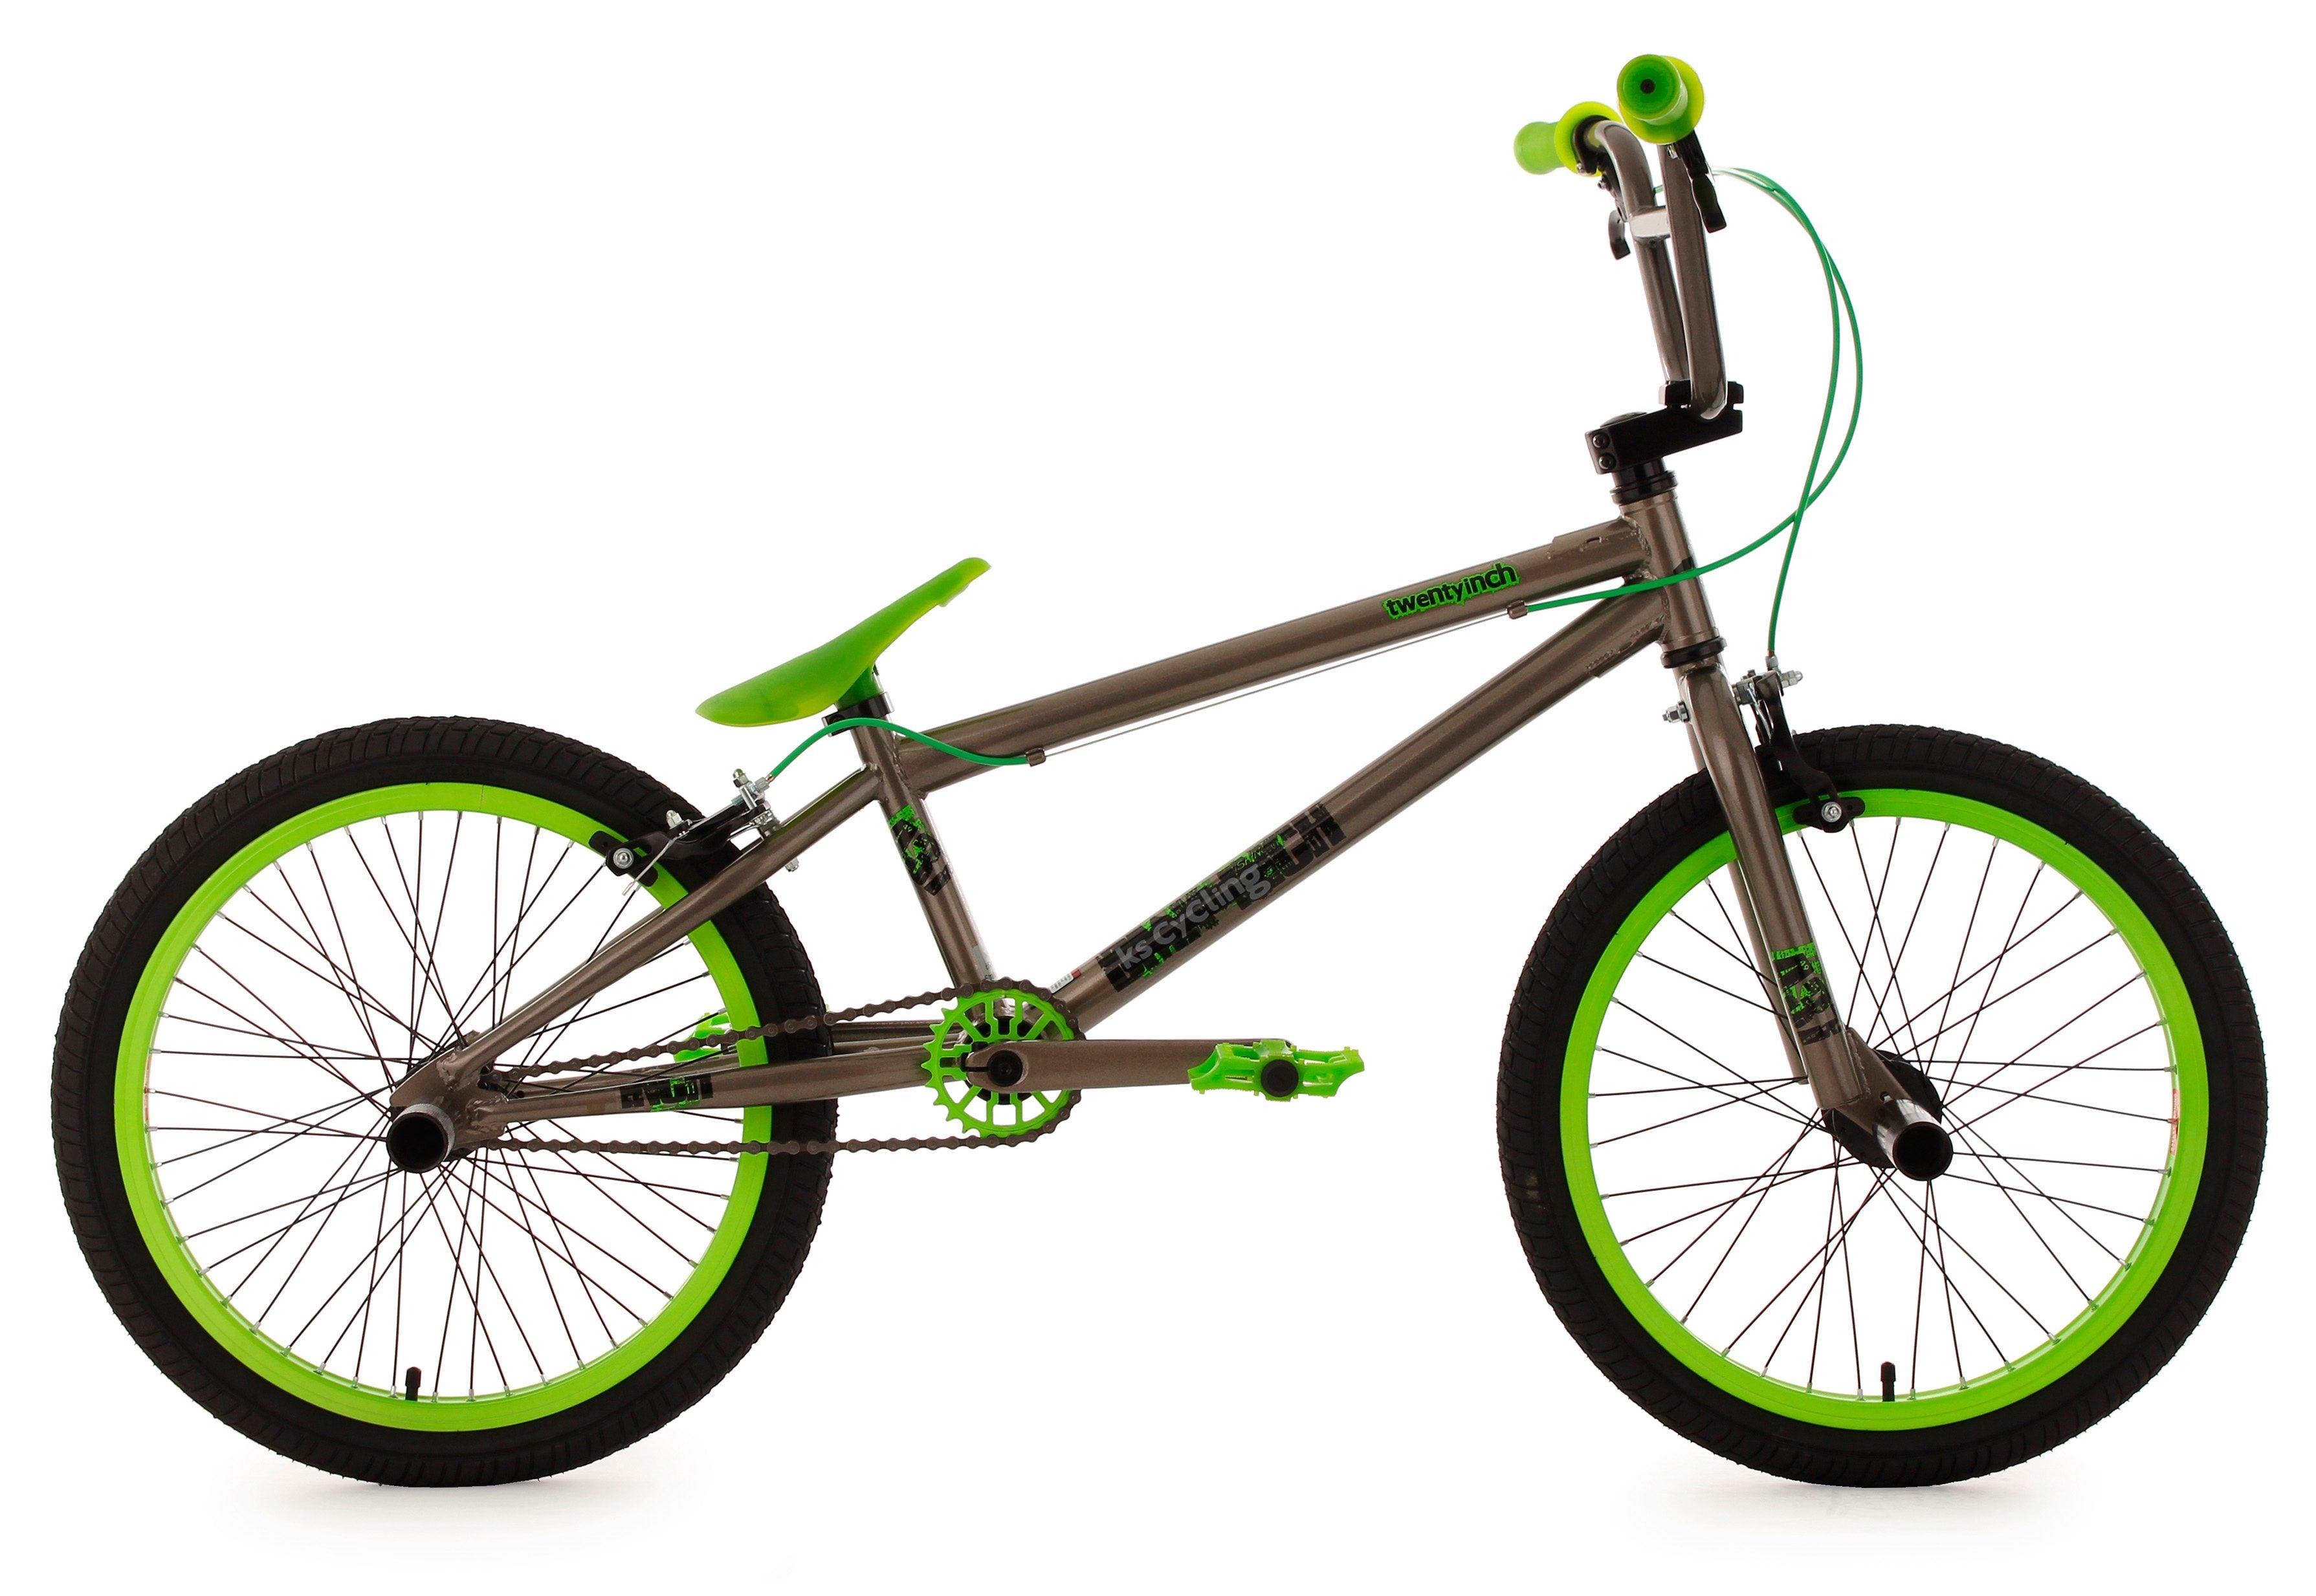 BMX Fahrrad, 20 Zoll, anthrazit-grün, »Twentyinch«, KS Cycling